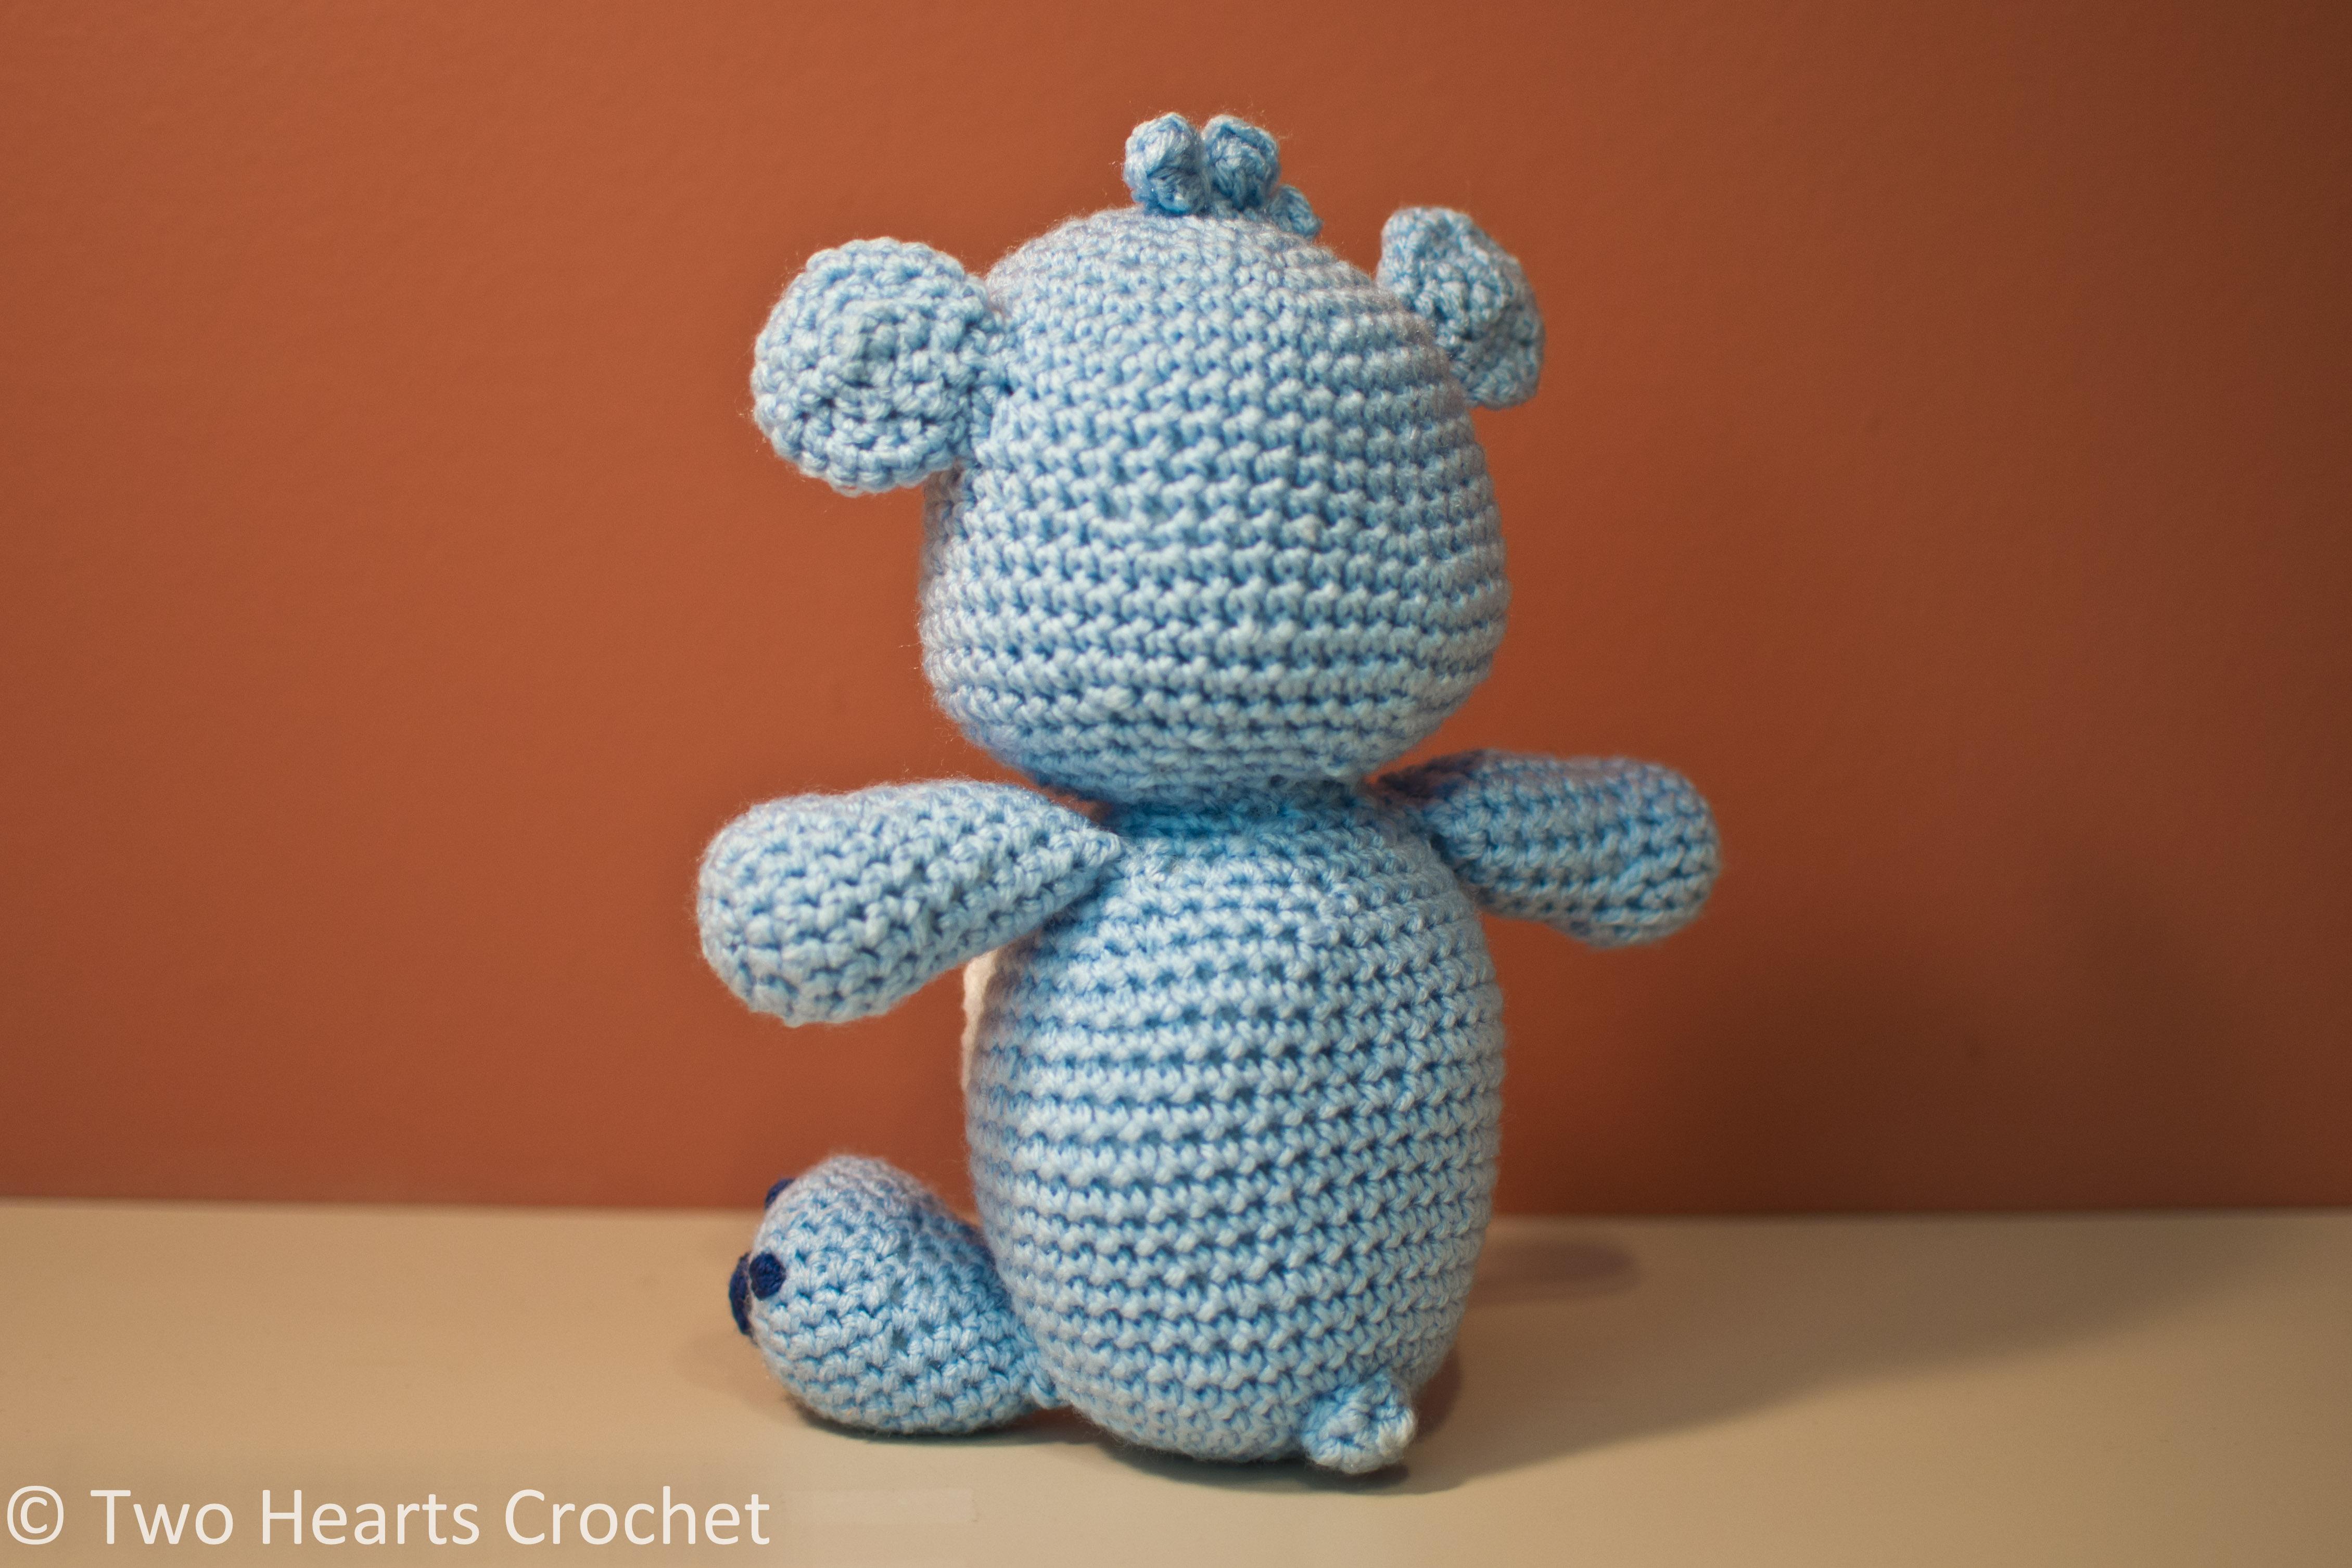 Meet: Jer Bear the Care Bear!